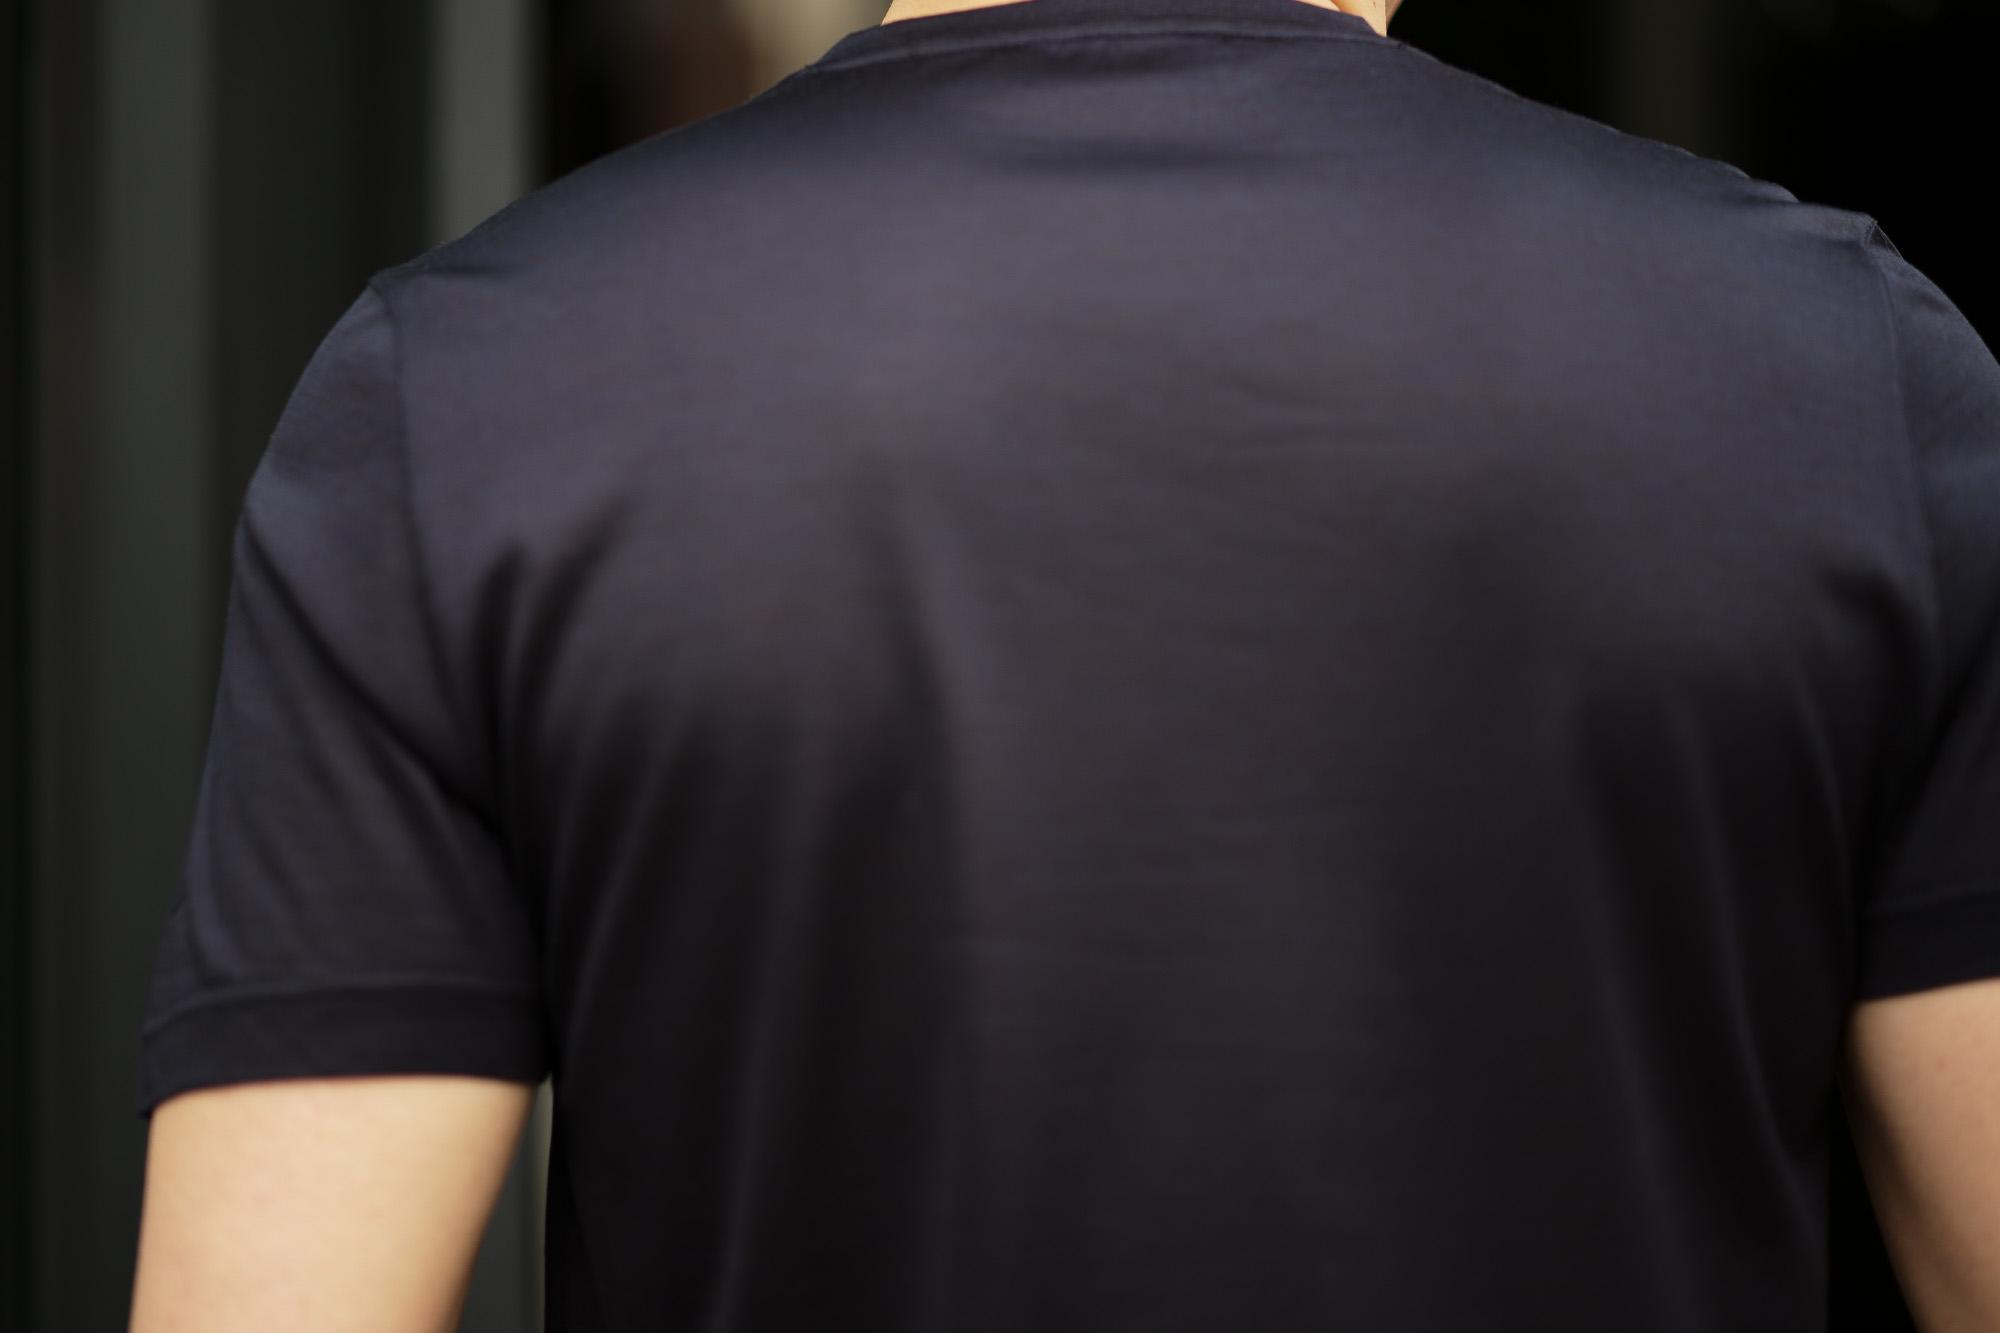 Gran Sasso (グランサッソ) Silk T-shirt (シルク Tシャツ) SETA (シルク 100%) ショートスリーブ シルク Tシャツ NAVY (ネイビー・308) made in italy (イタリア製) 2020 春夏新作   愛知 名古屋 altoediritto アルトエデリット